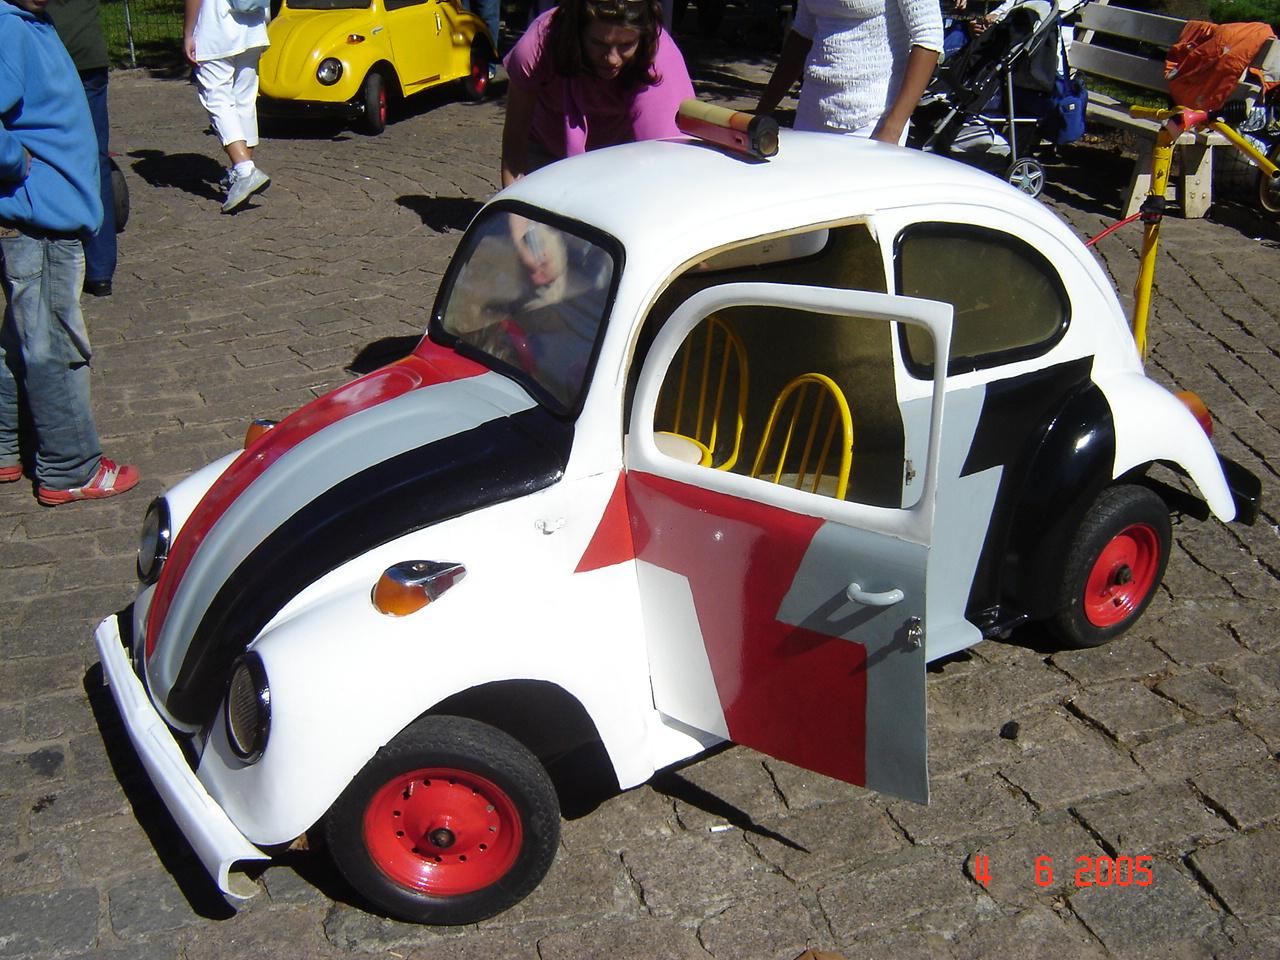 Car Toys Federal Way: Lê M.D.: Pequenos Carros De Polícia / Little Police Cars